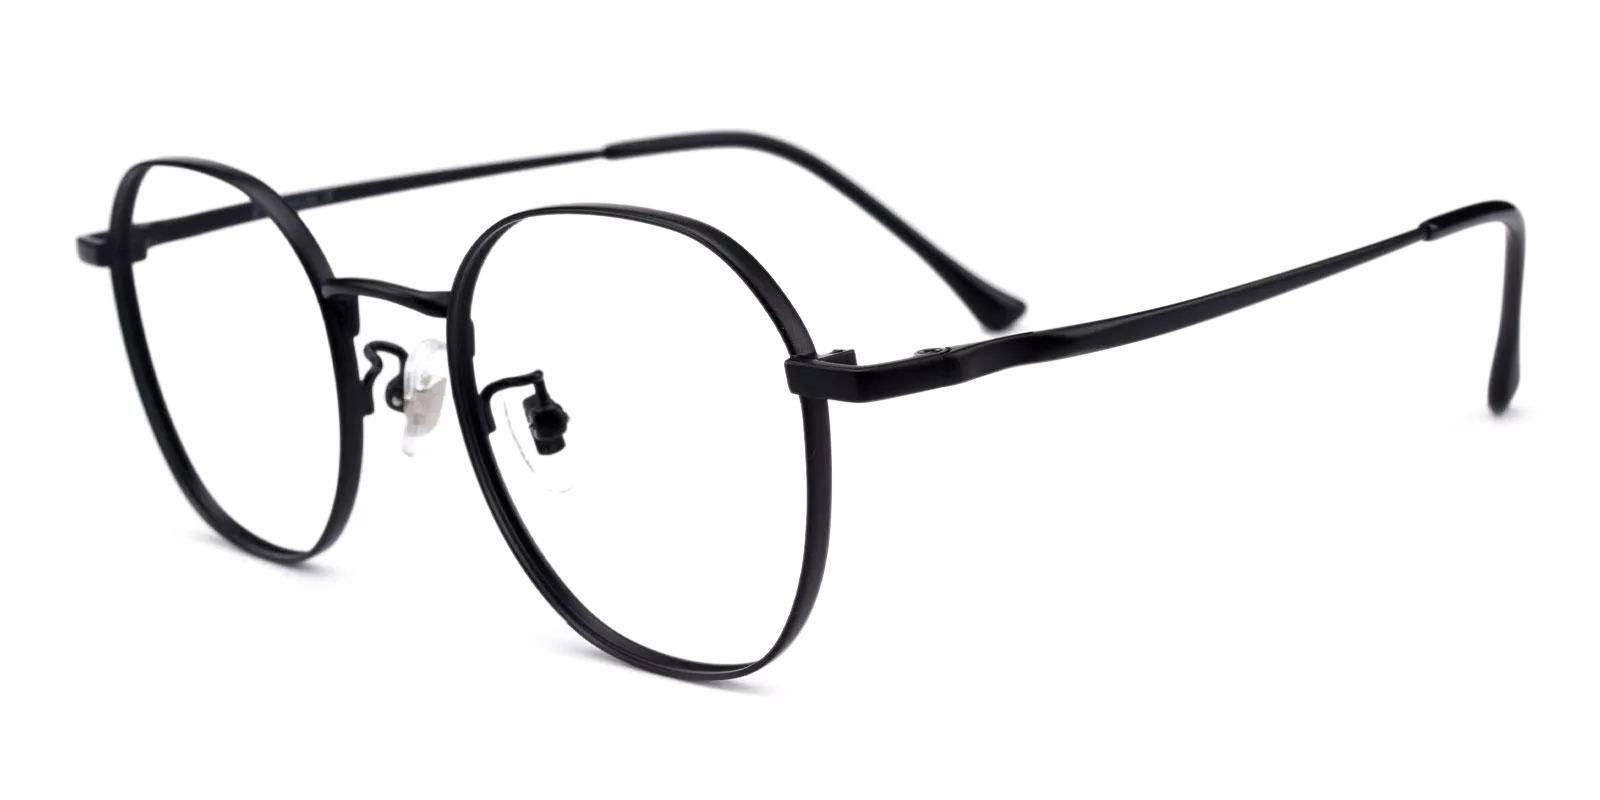 Community Black Metal Eyeglasses , Fashion , NosePads Frames from ABBE Glasses